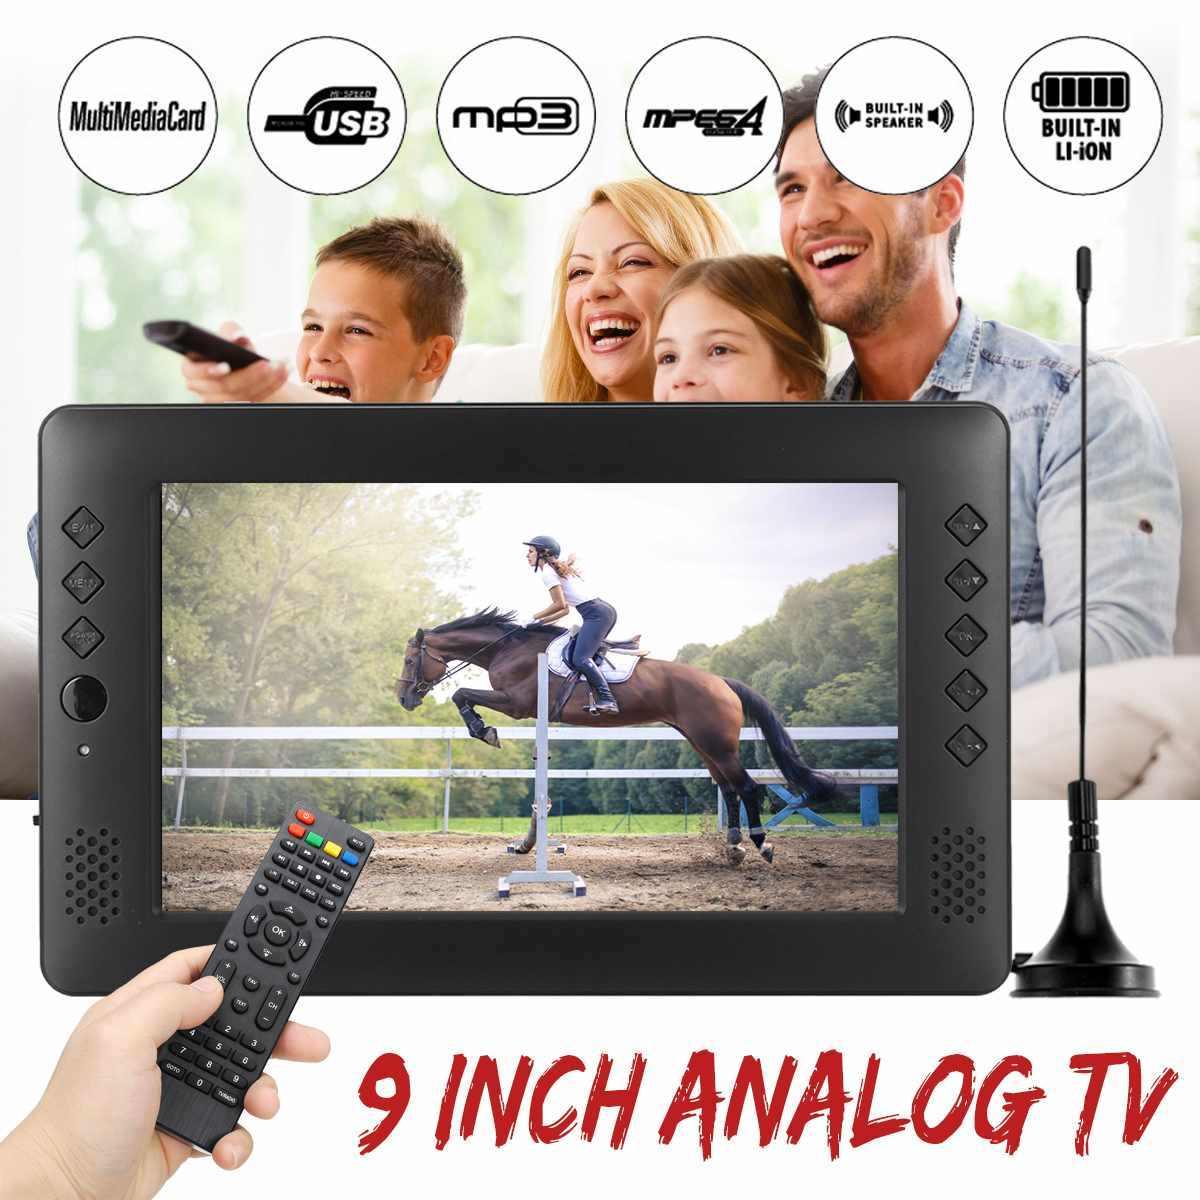 12 V 9 zoll HD Tragbare Mini WiFi Digital und Analog TV DVB-T2 DVB-T DTV ATV Auto Smart Fernsehen Unterstützung USB TF Karte MP4